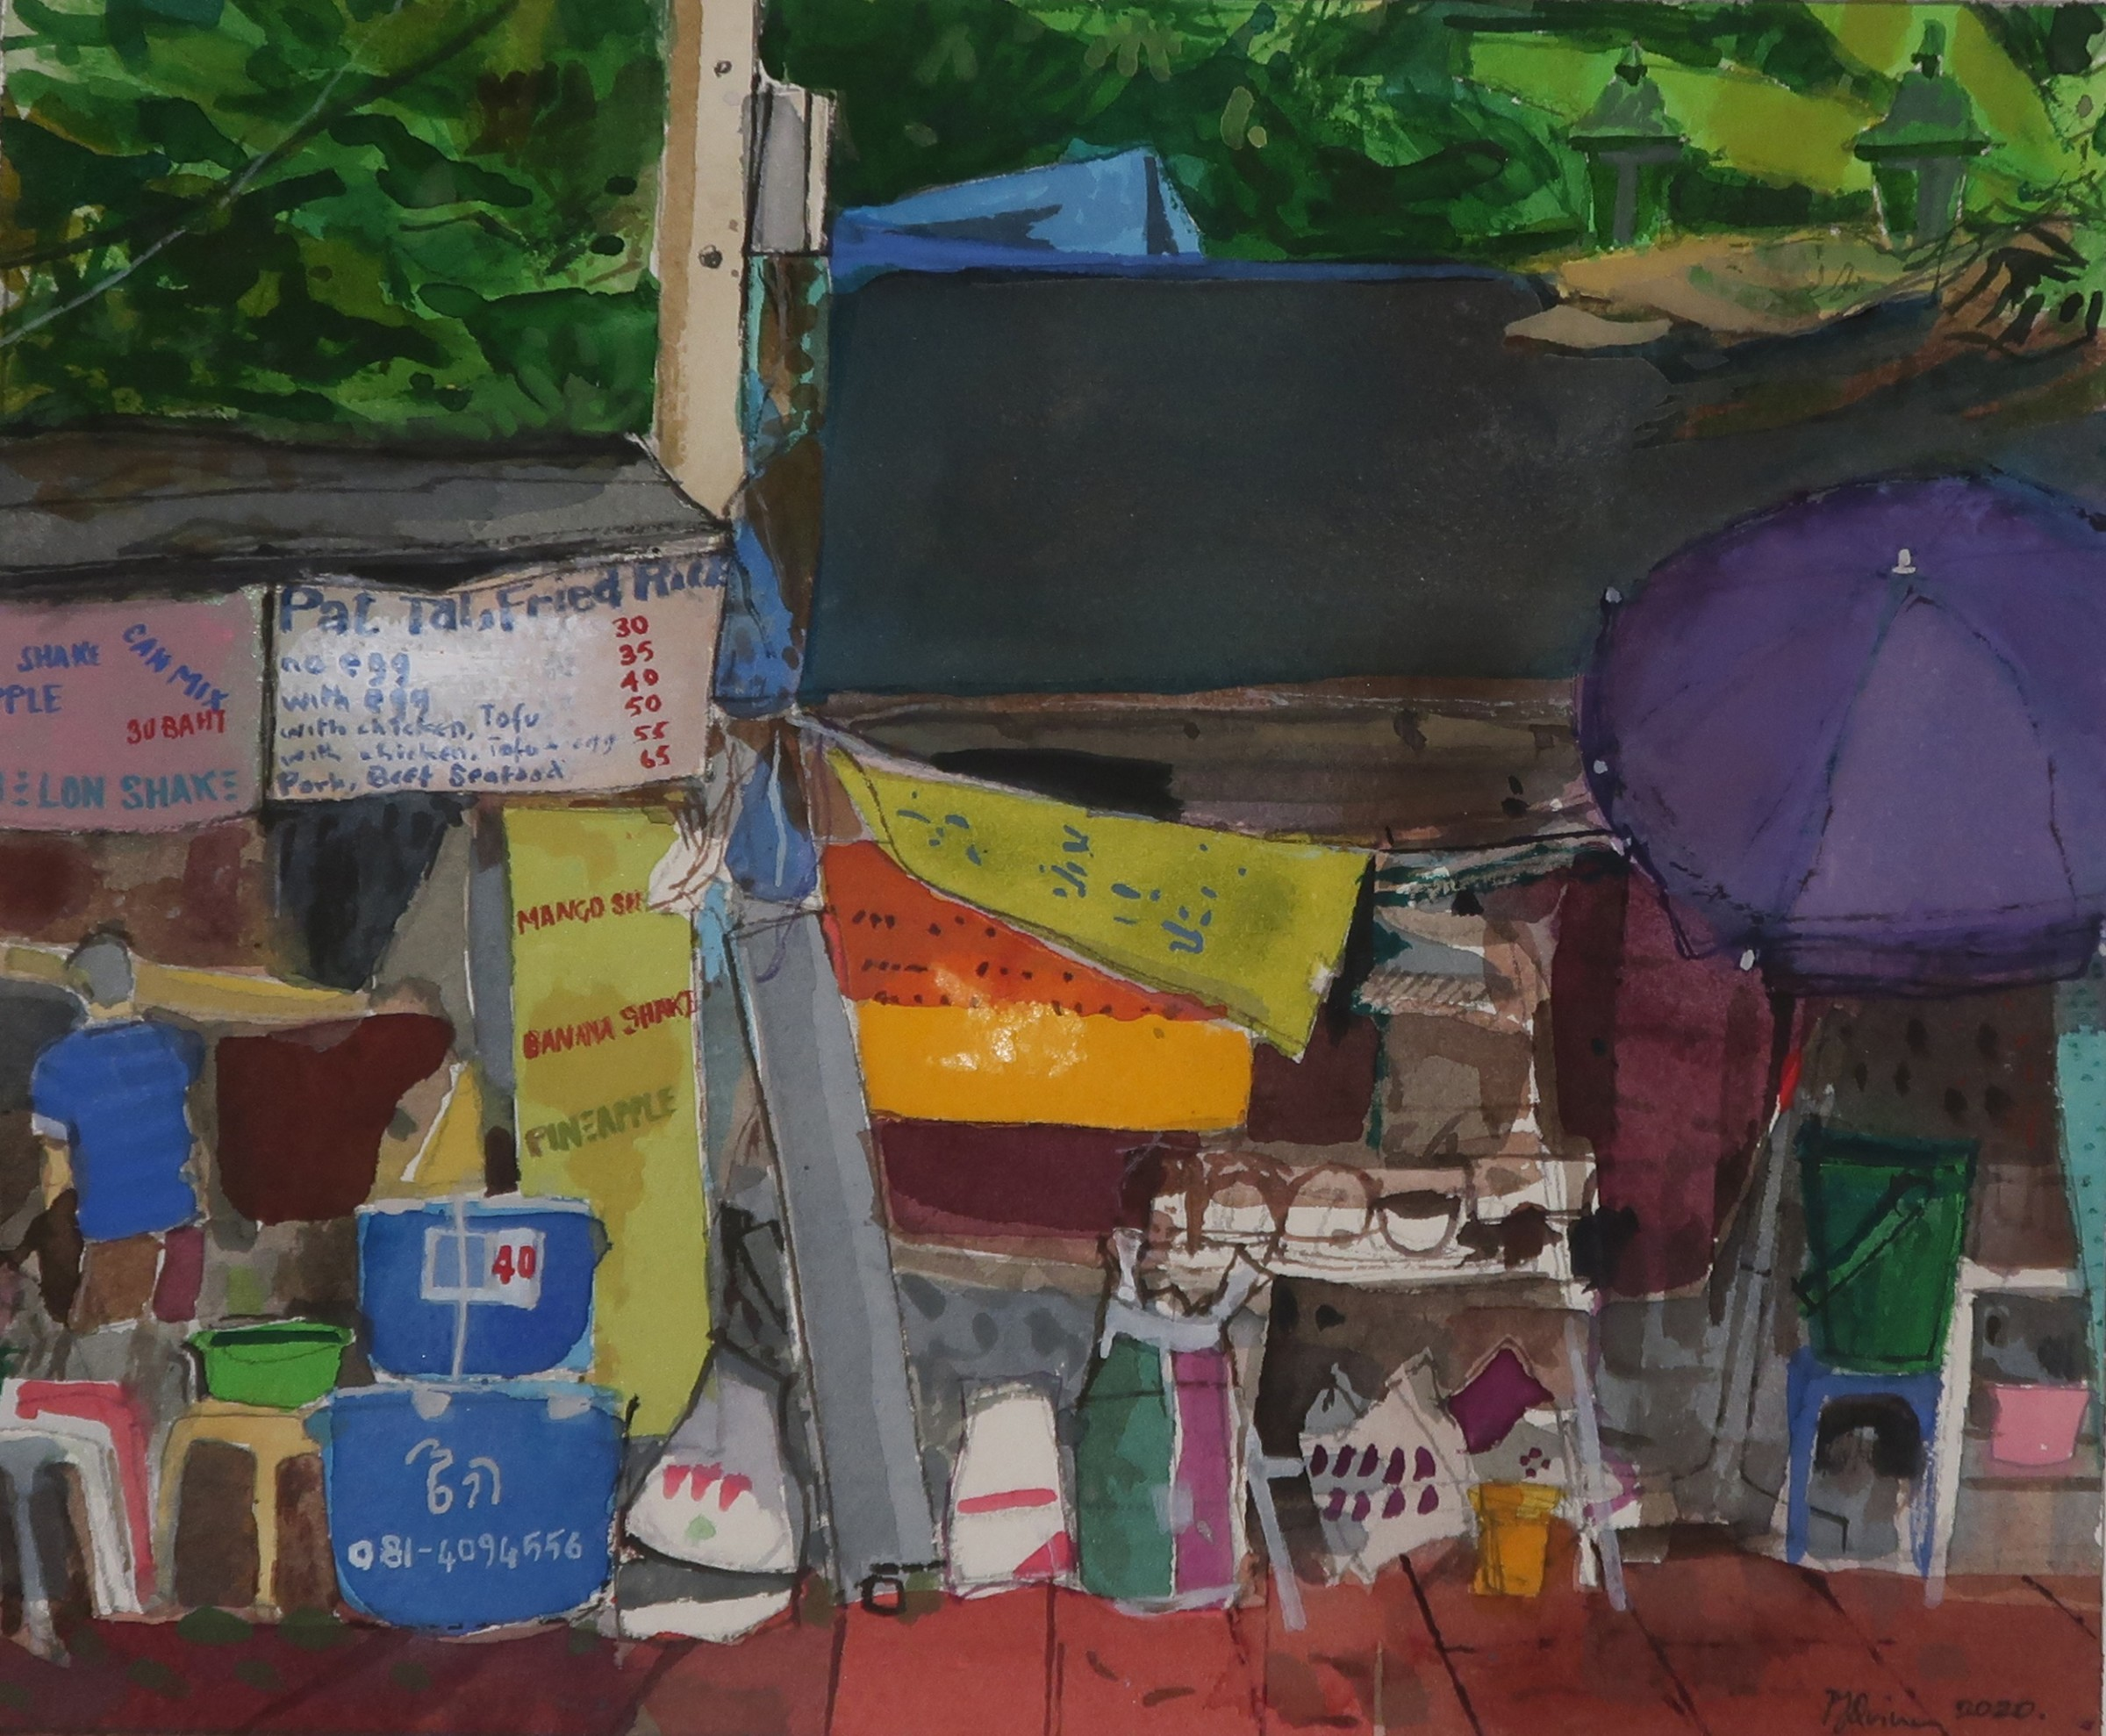 "<span class=""link fancybox-details-link""><a href=""/artists/96-peter-quinn/works/12464-peter-quinn-street-food-stalls-bangkok/"">View Detail Page</a></span><div class=""artist""><span class=""artist""><strong>Peter Quinn</strong></span></div><div class=""title""><em>Street Food Stalls, Bangkok</em></div><div class=""medium"">watercolour on paper</div><div class=""dimensions"">Frame: 45 x 50 cm<br /> Artwork: 24 x 29 cm</div><div class=""price"">£650.00</div>"